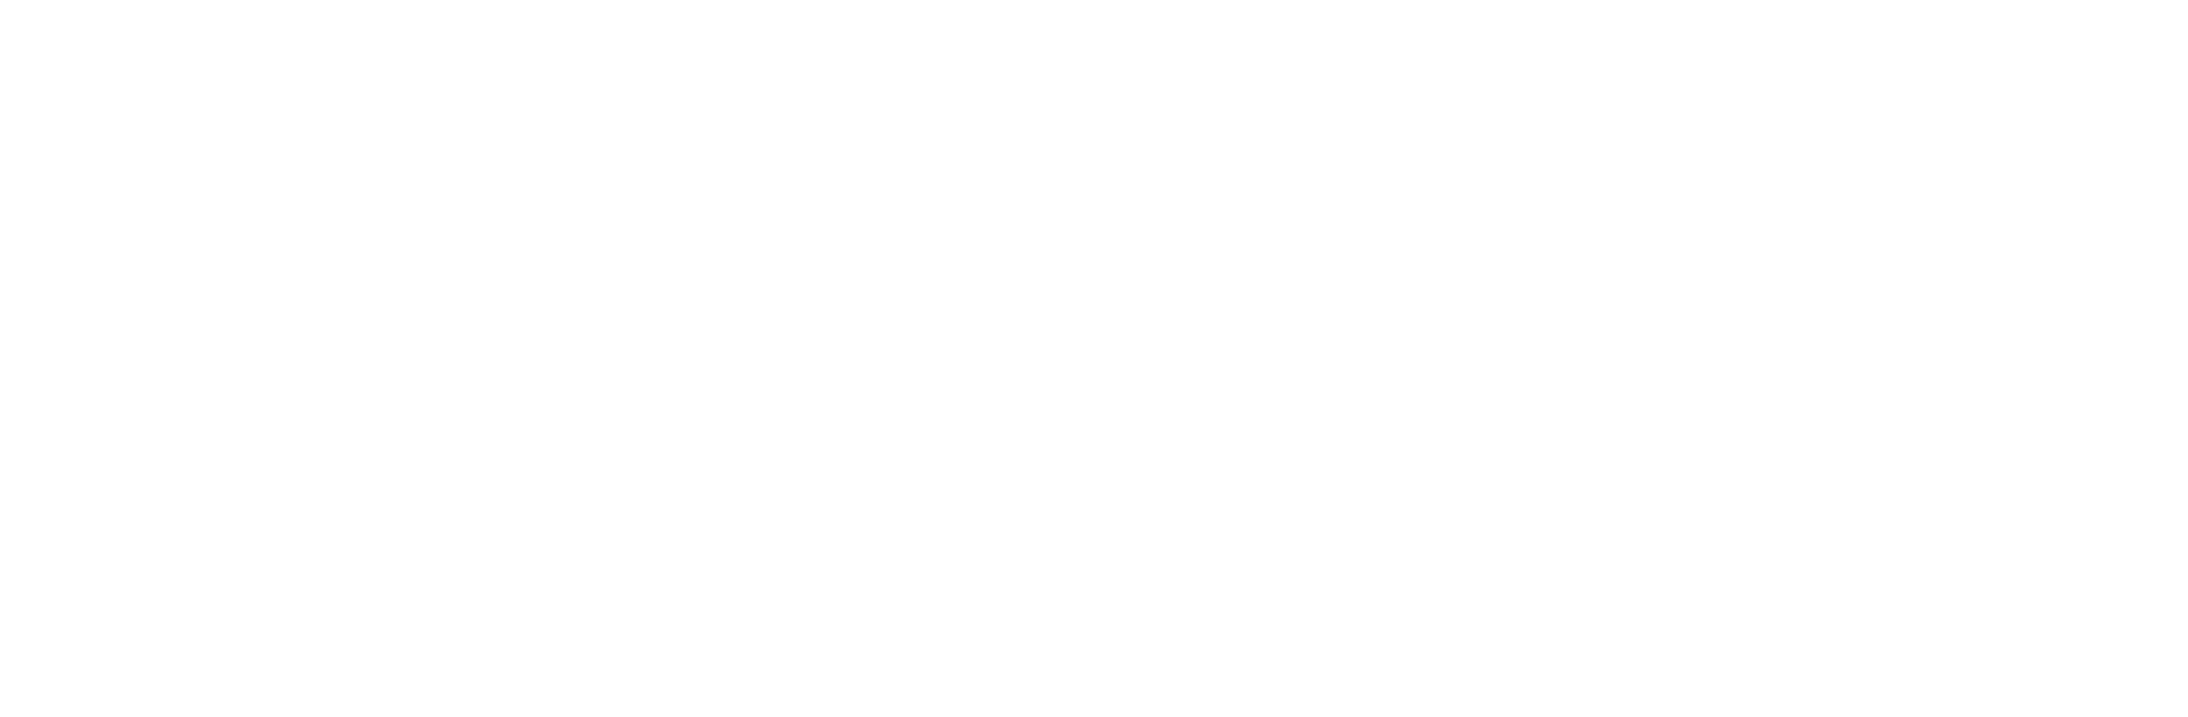 2019_RA-Partner-Logos_AuthorizedDistributor_FT-AB_white